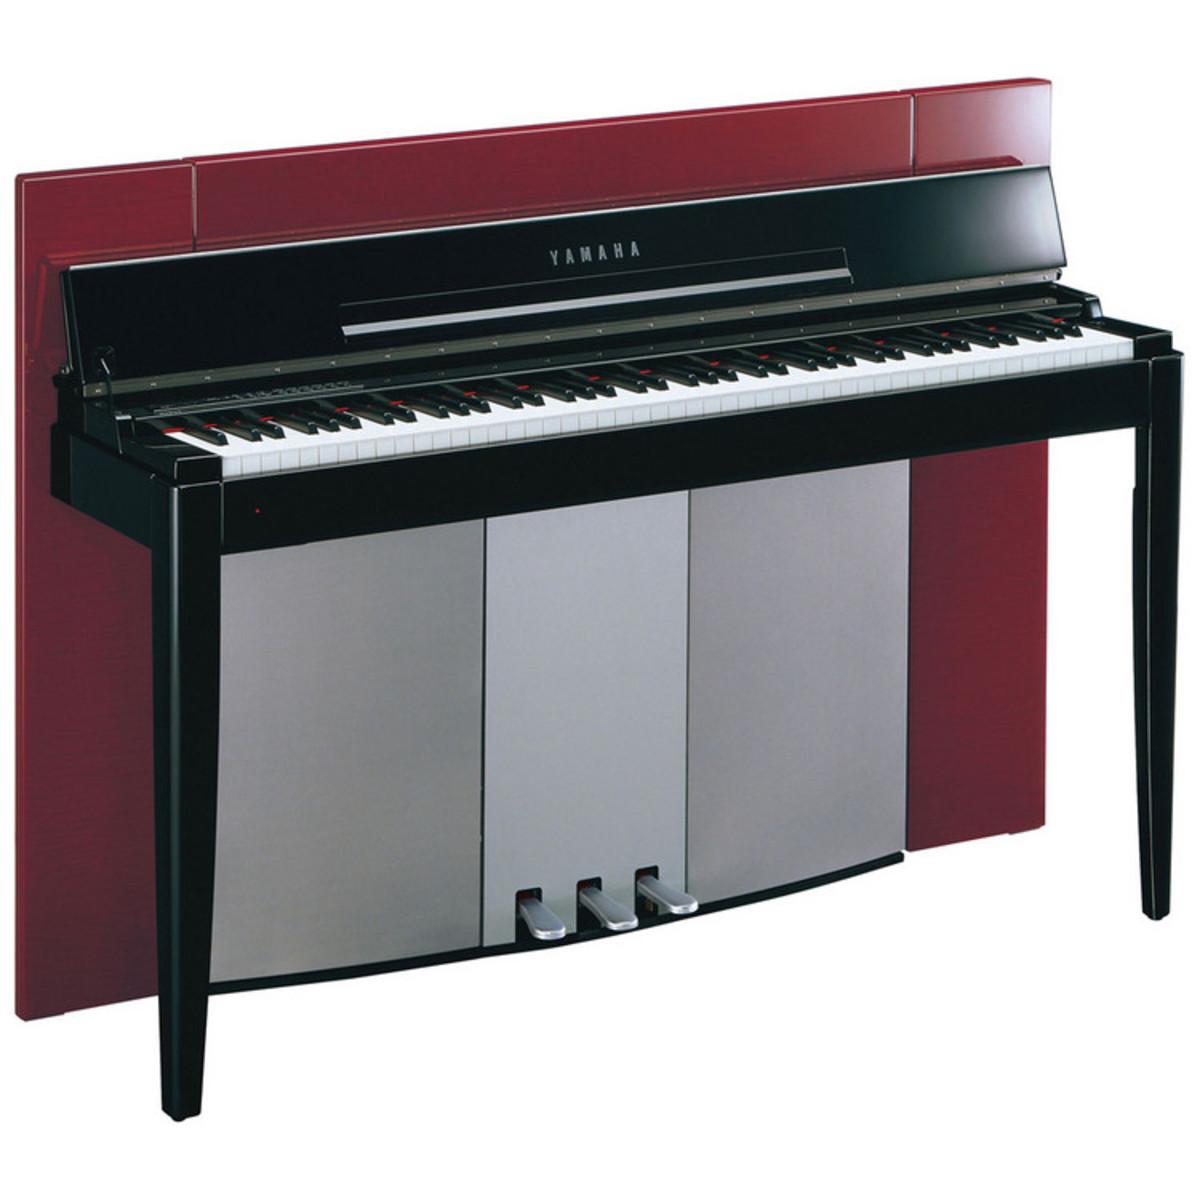 Yamaha Pe Grand Piano